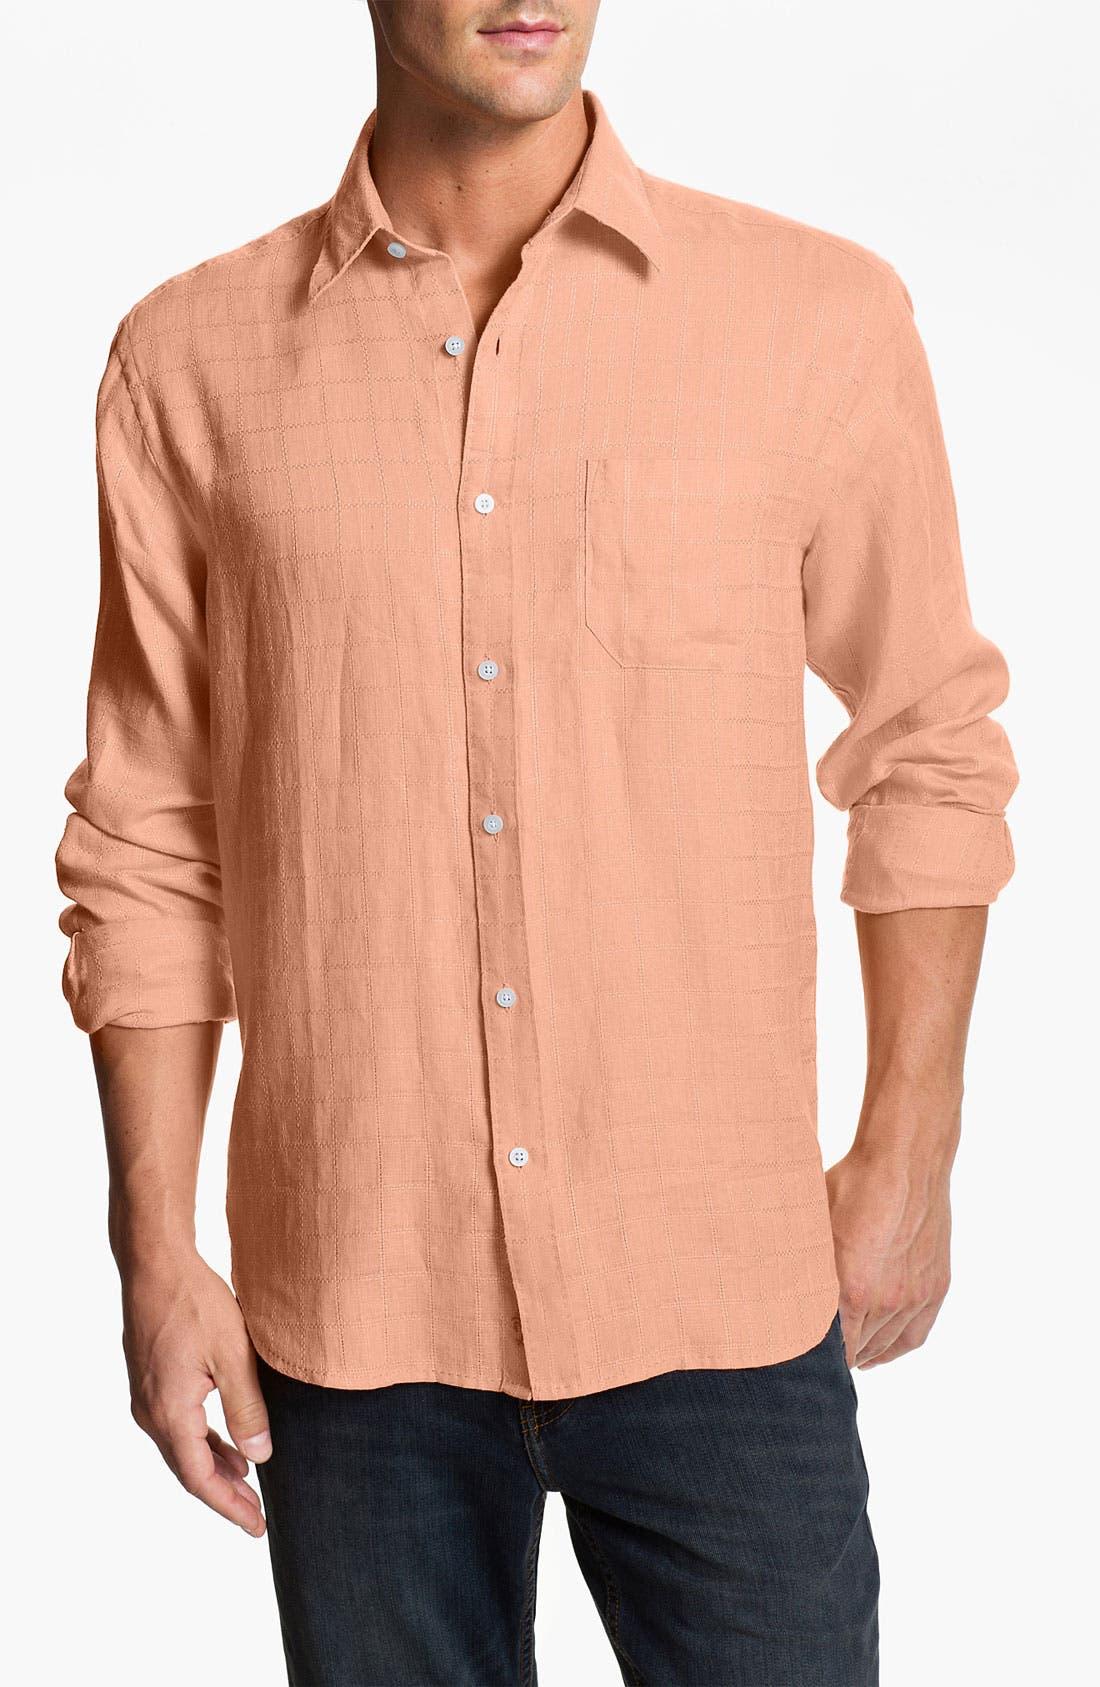 Main Image - Tommy Bahama 'Costa Sera' Linen Sport Shirt (Big & Tall)